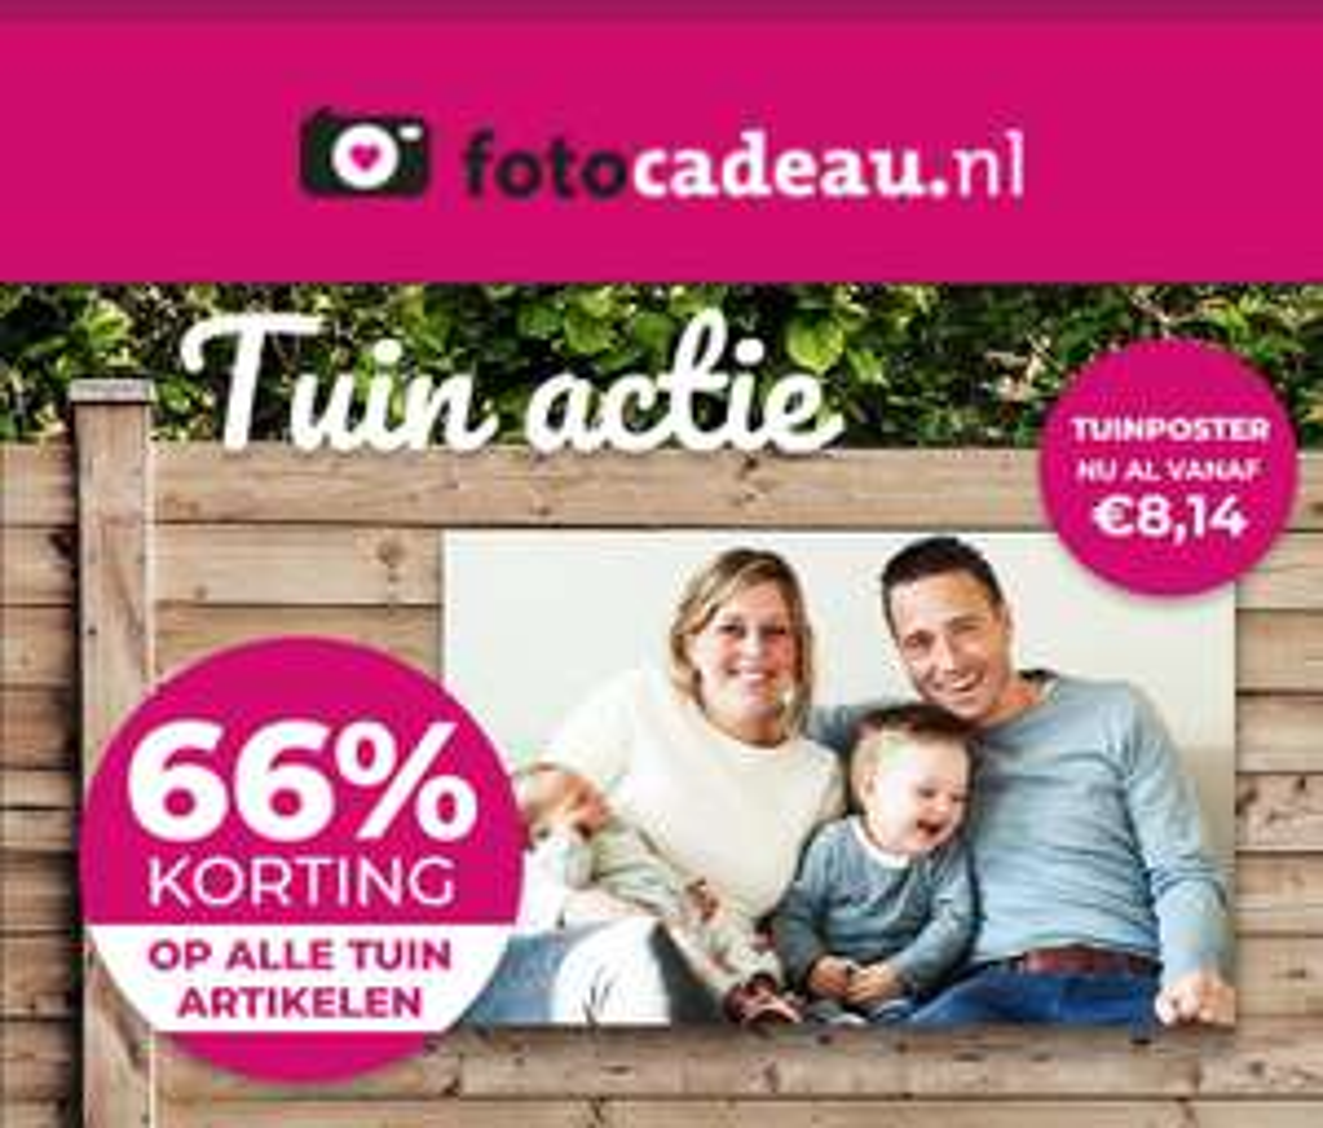 Fotocadeau.nl nu 66% korting op tuinartikelen